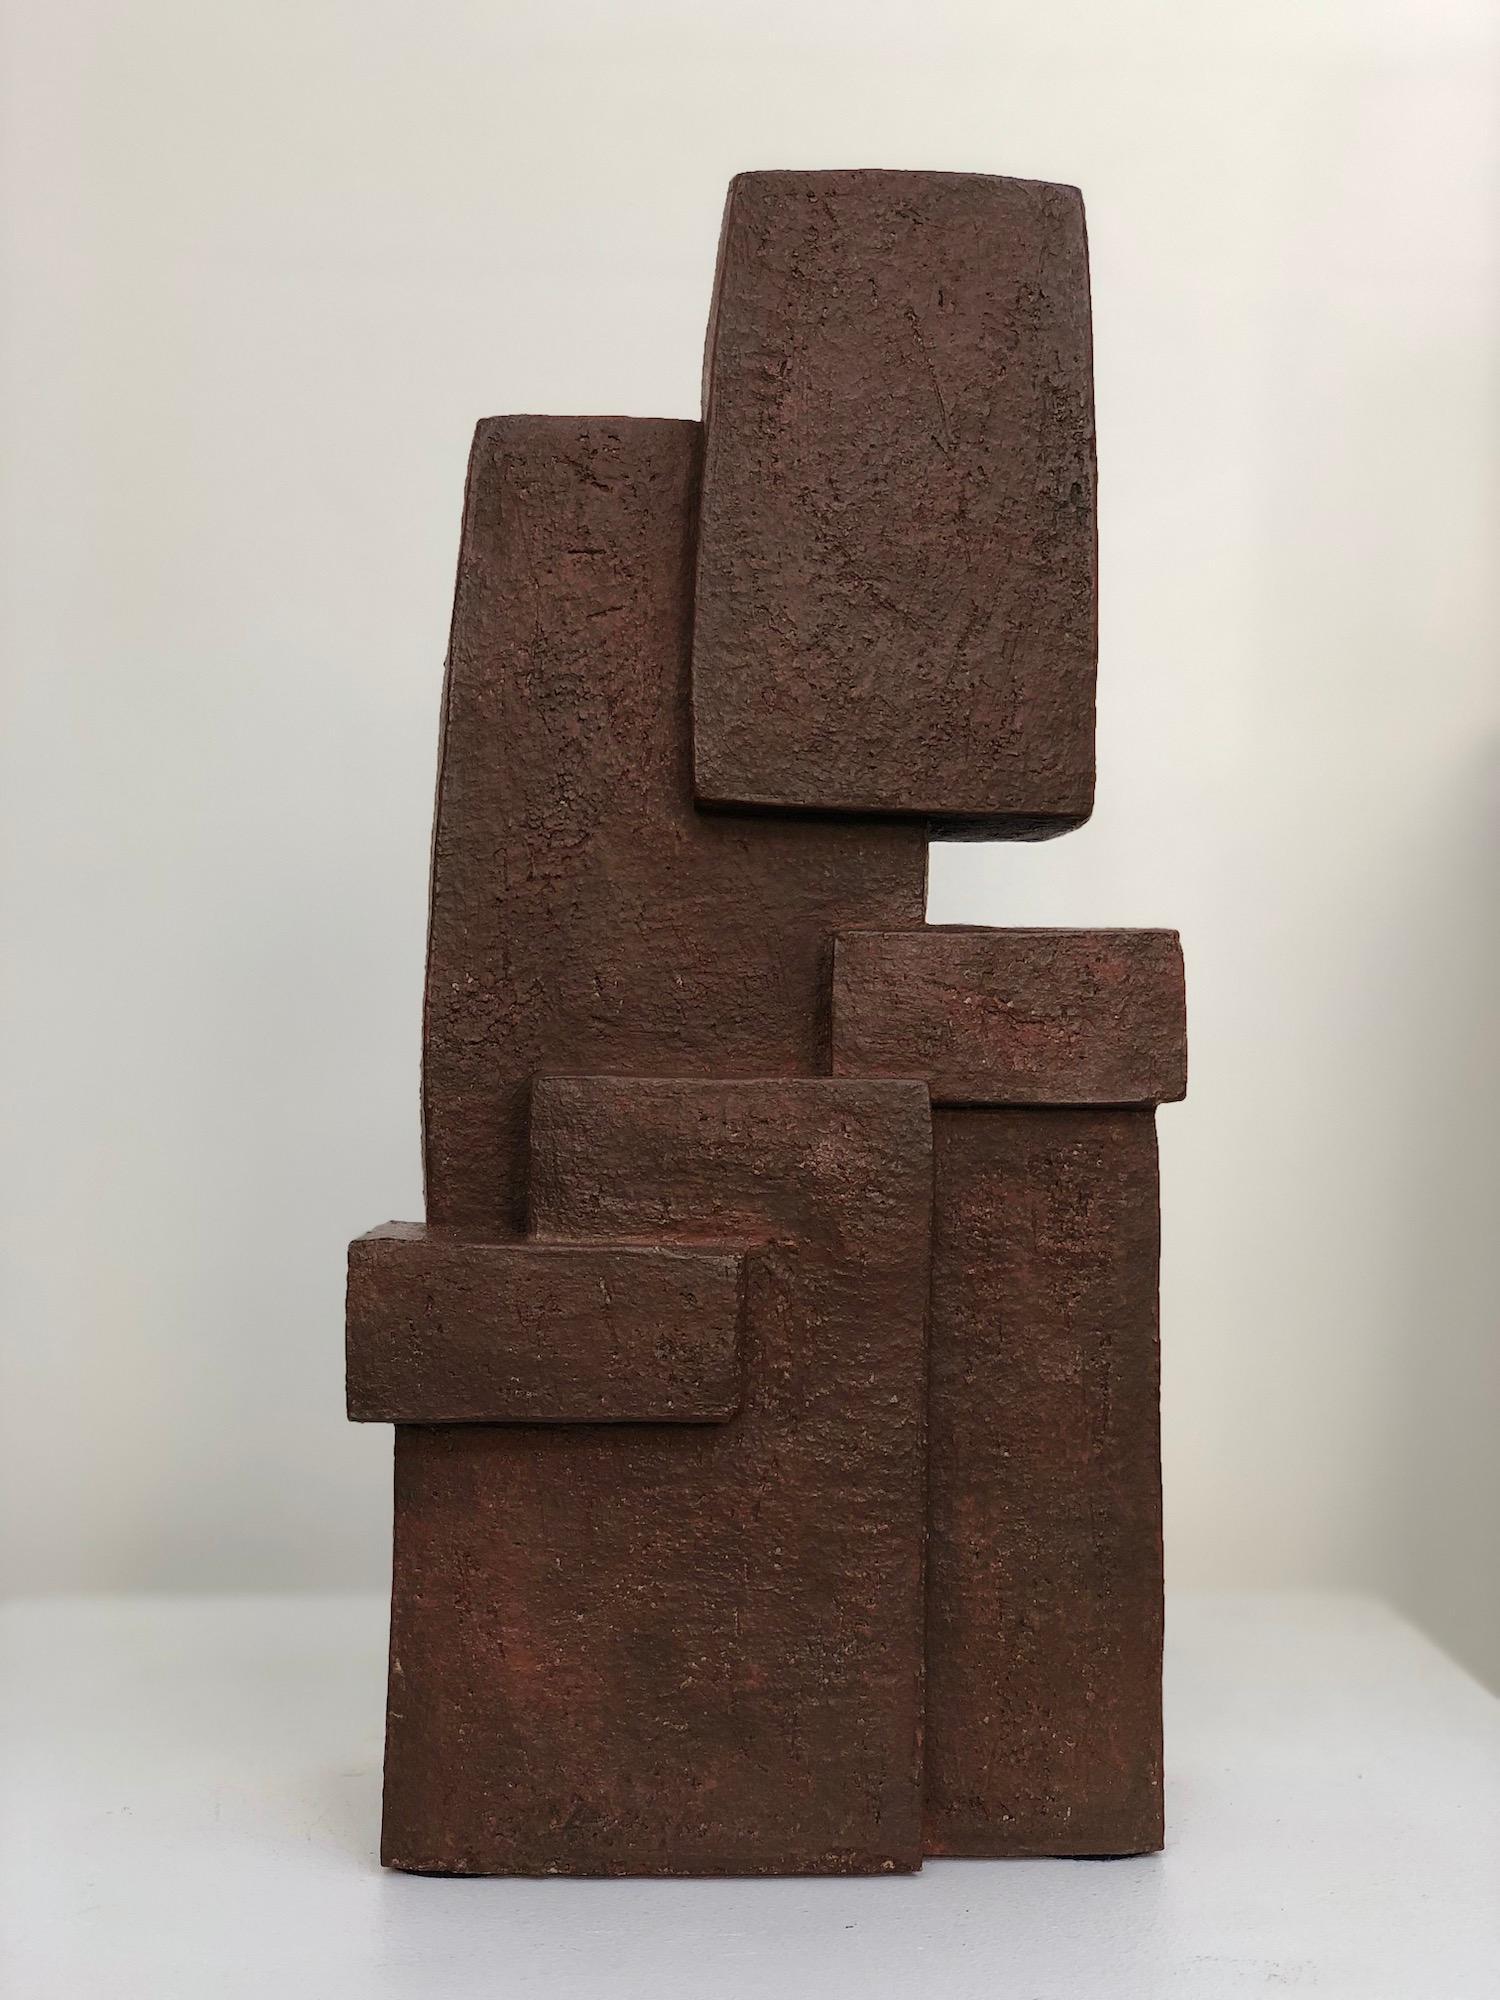 Unity IV, Delphine Brabant - abstract geometric sculpture, terracotta